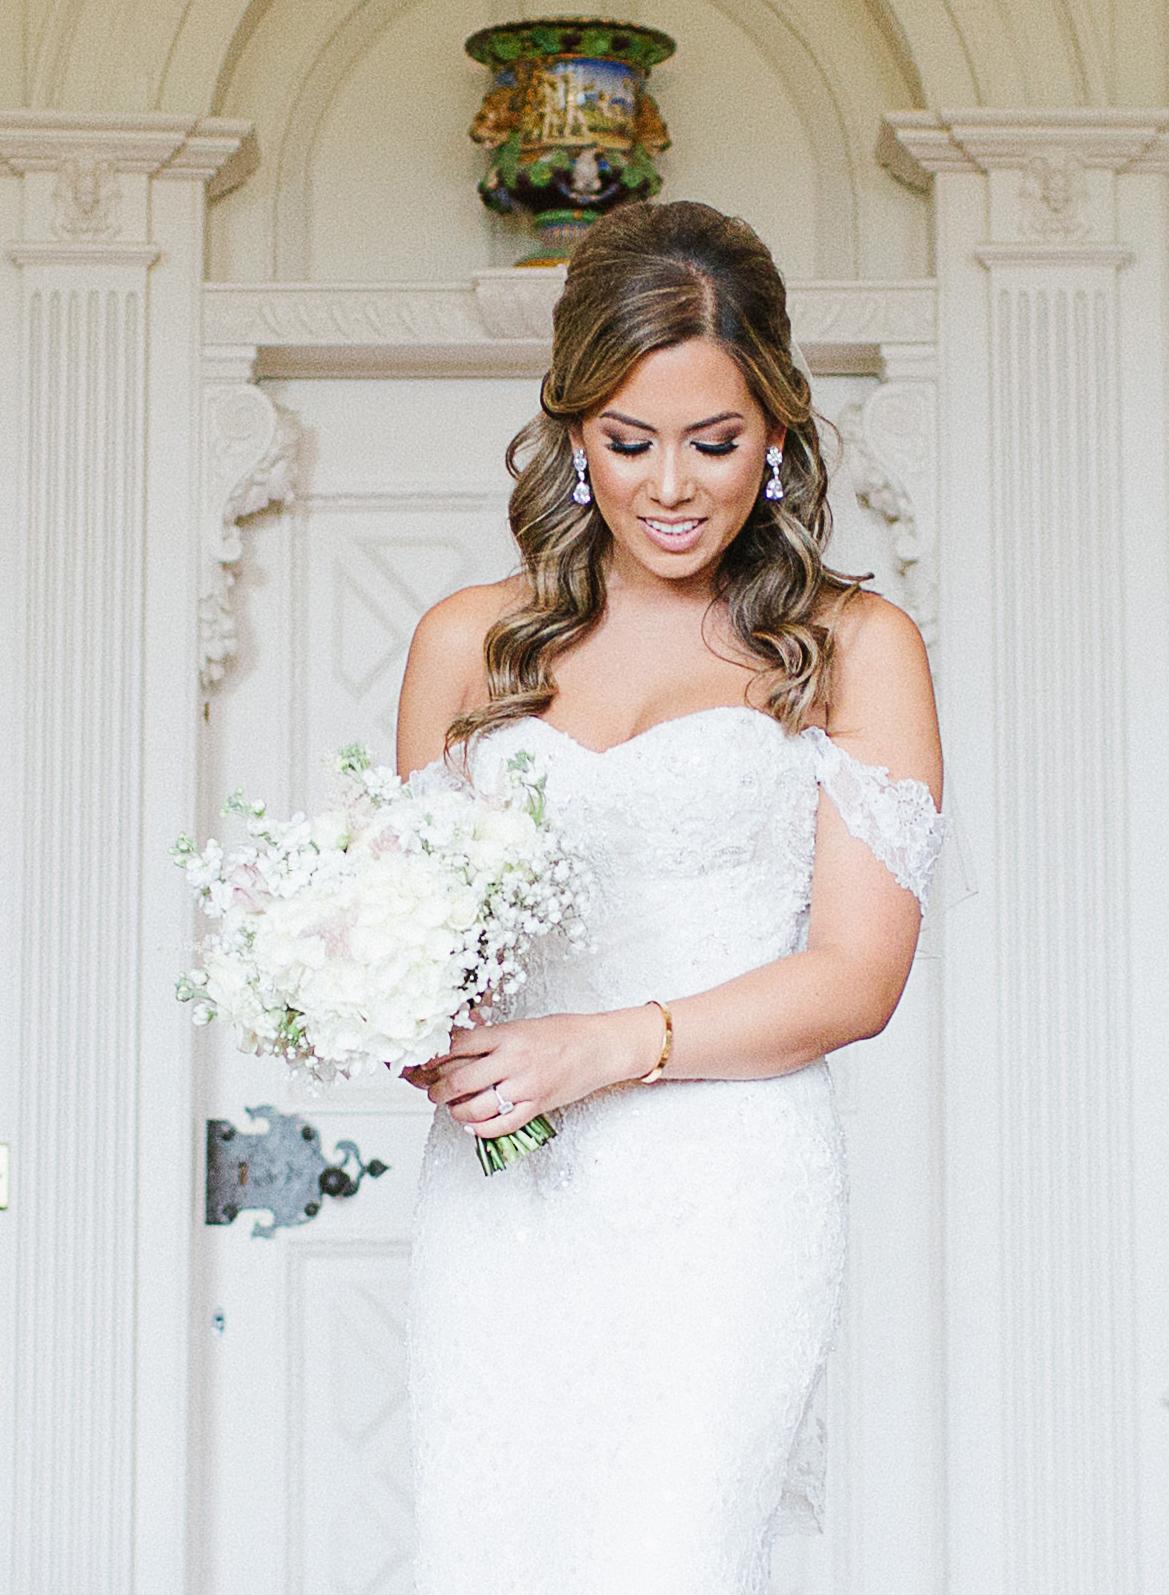 Ardington-house-wedding-ilaria-petrucci-photography-sophie-and-david-184 copy